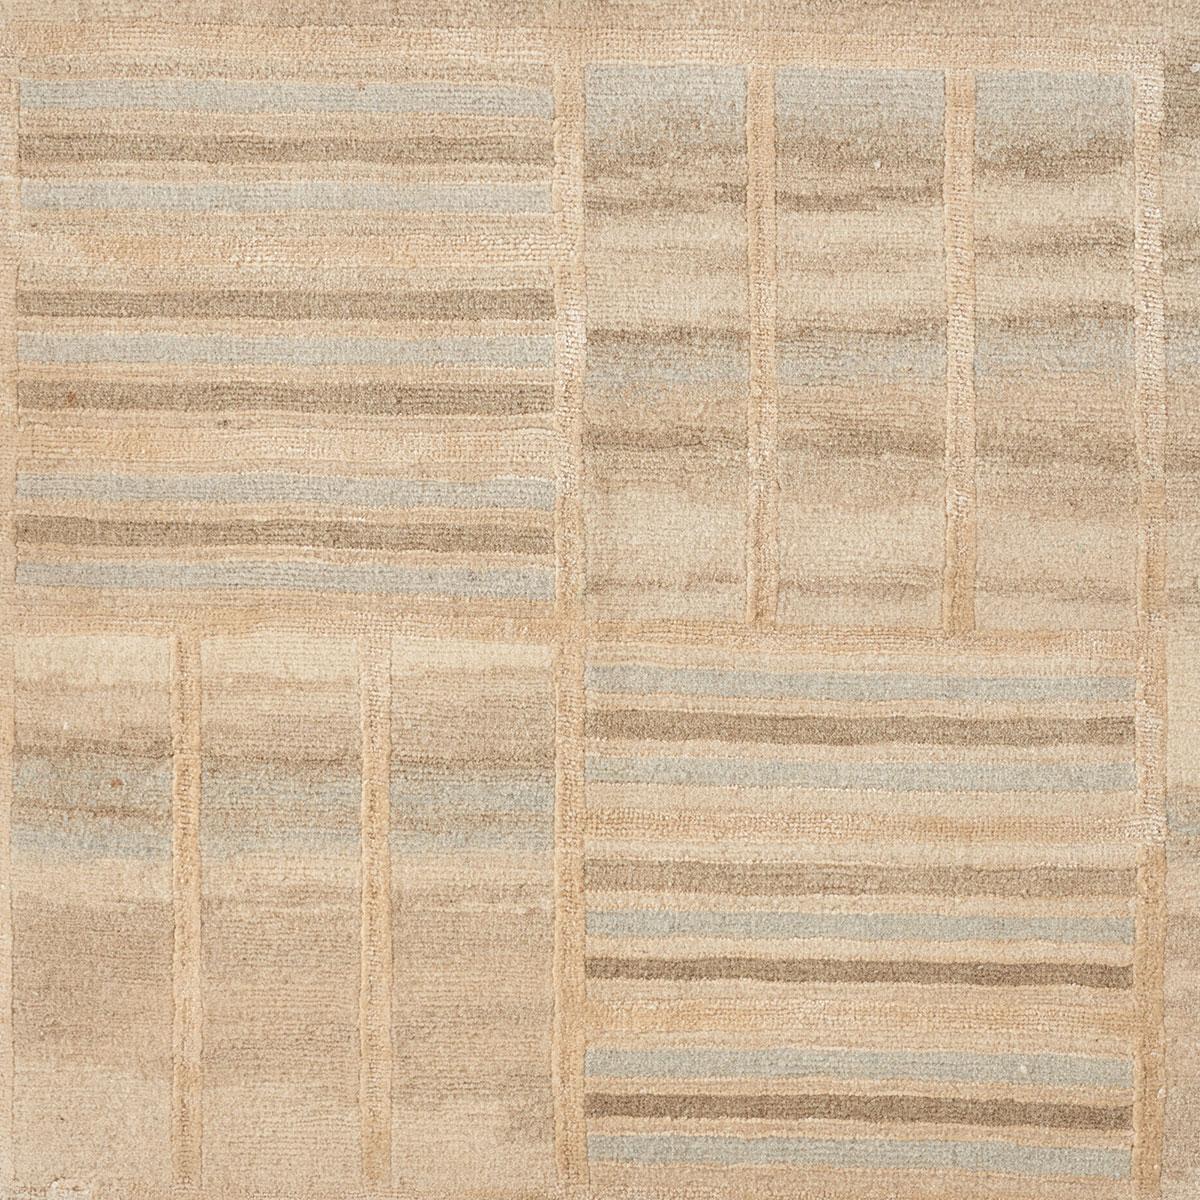 oceania-horizontal-stripe_wool-silk_hand-knotted_patterson-flynn-martin_pfm